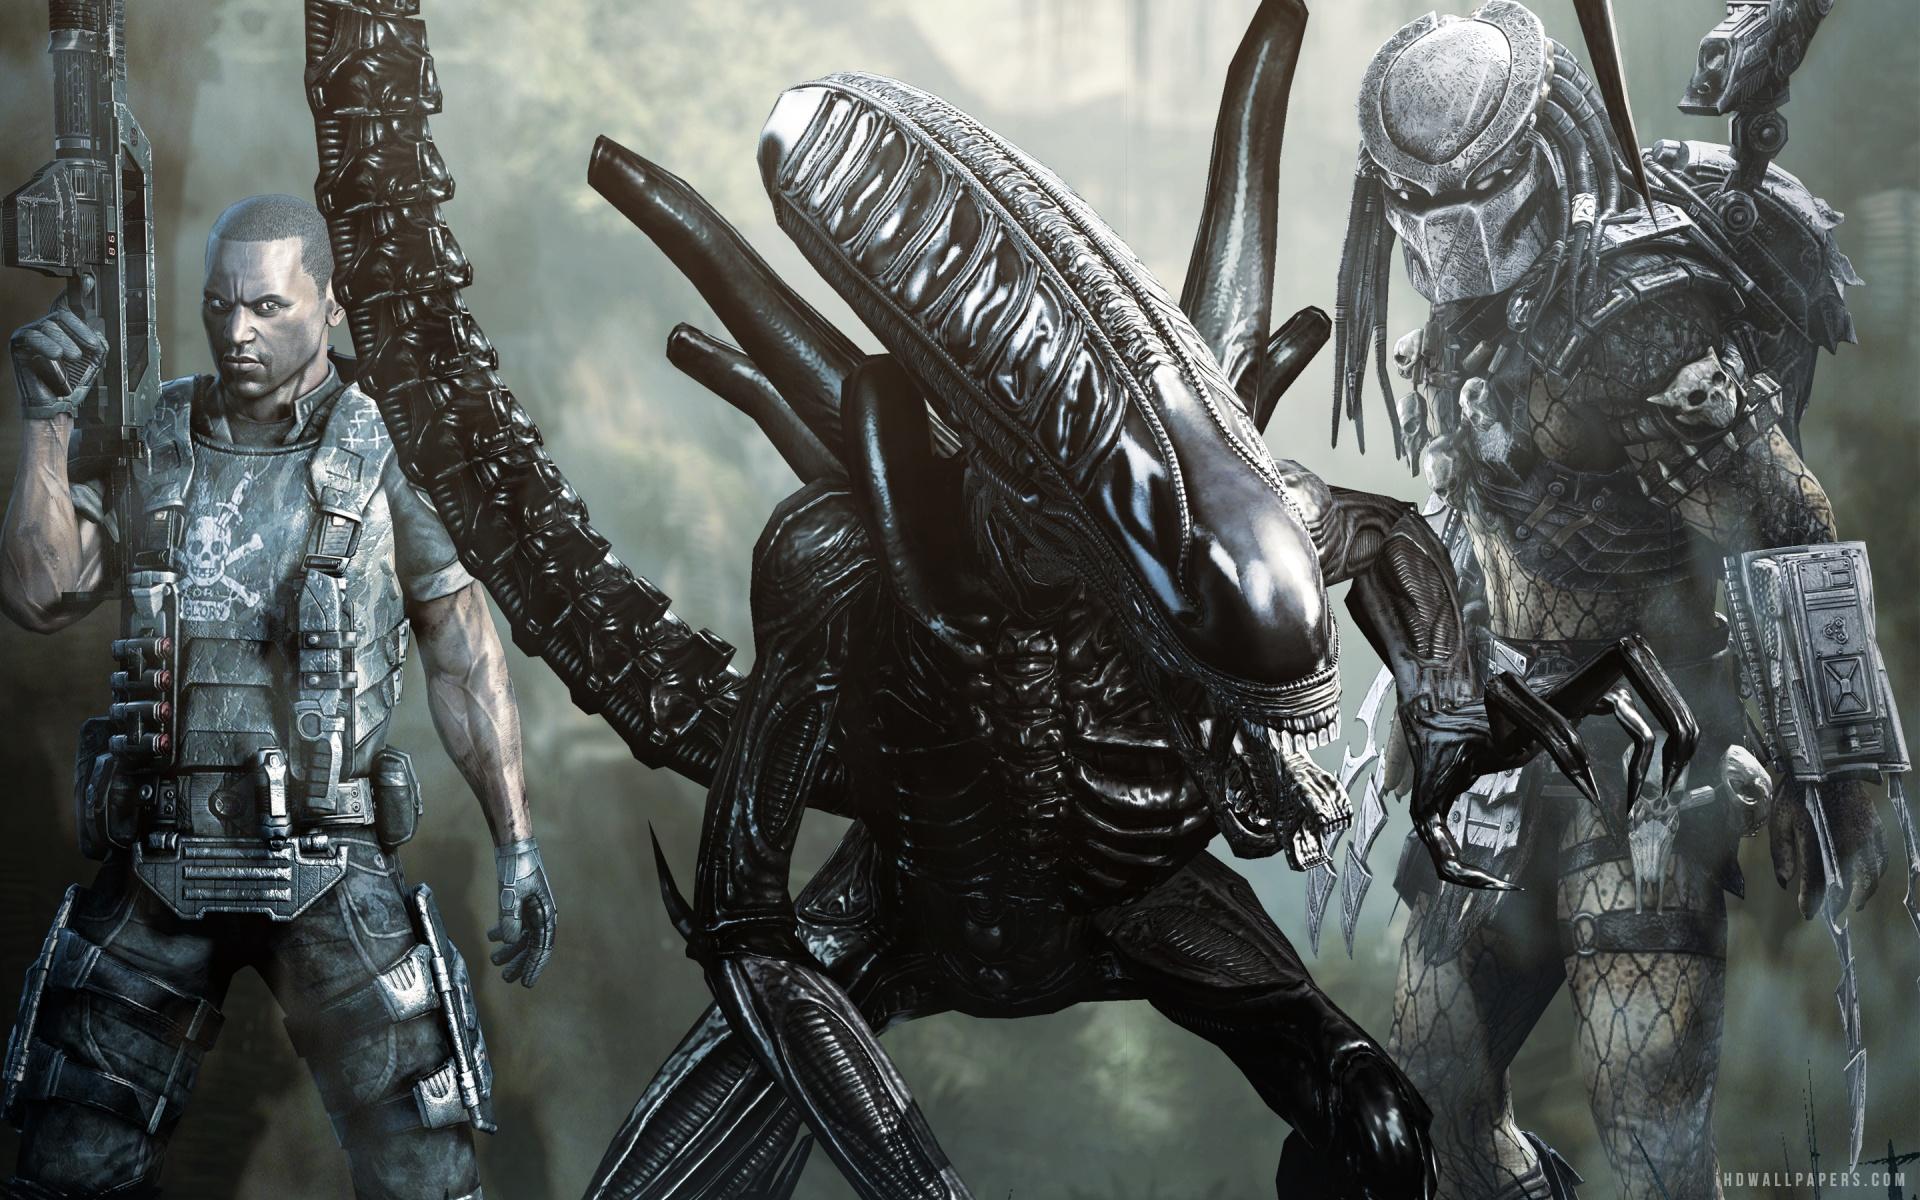 Aliens vs Predator Game HD Wallpaper   iHD Wallpapers 1920x1200